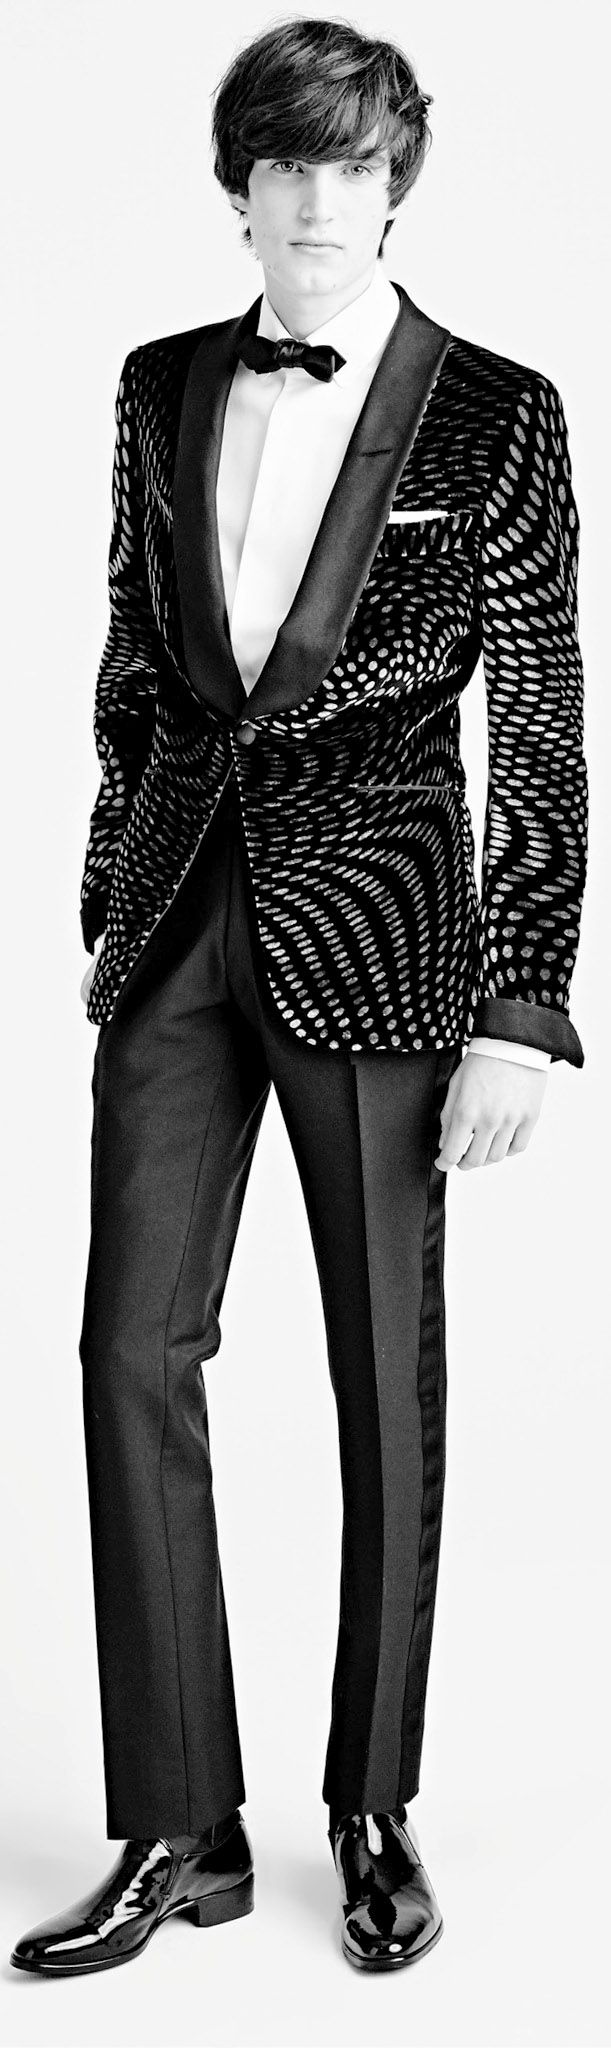 Tom Ford Fall 2015 Menswear   justjune   Men Clothing   Pinterest ... 6eaed5bb8f29